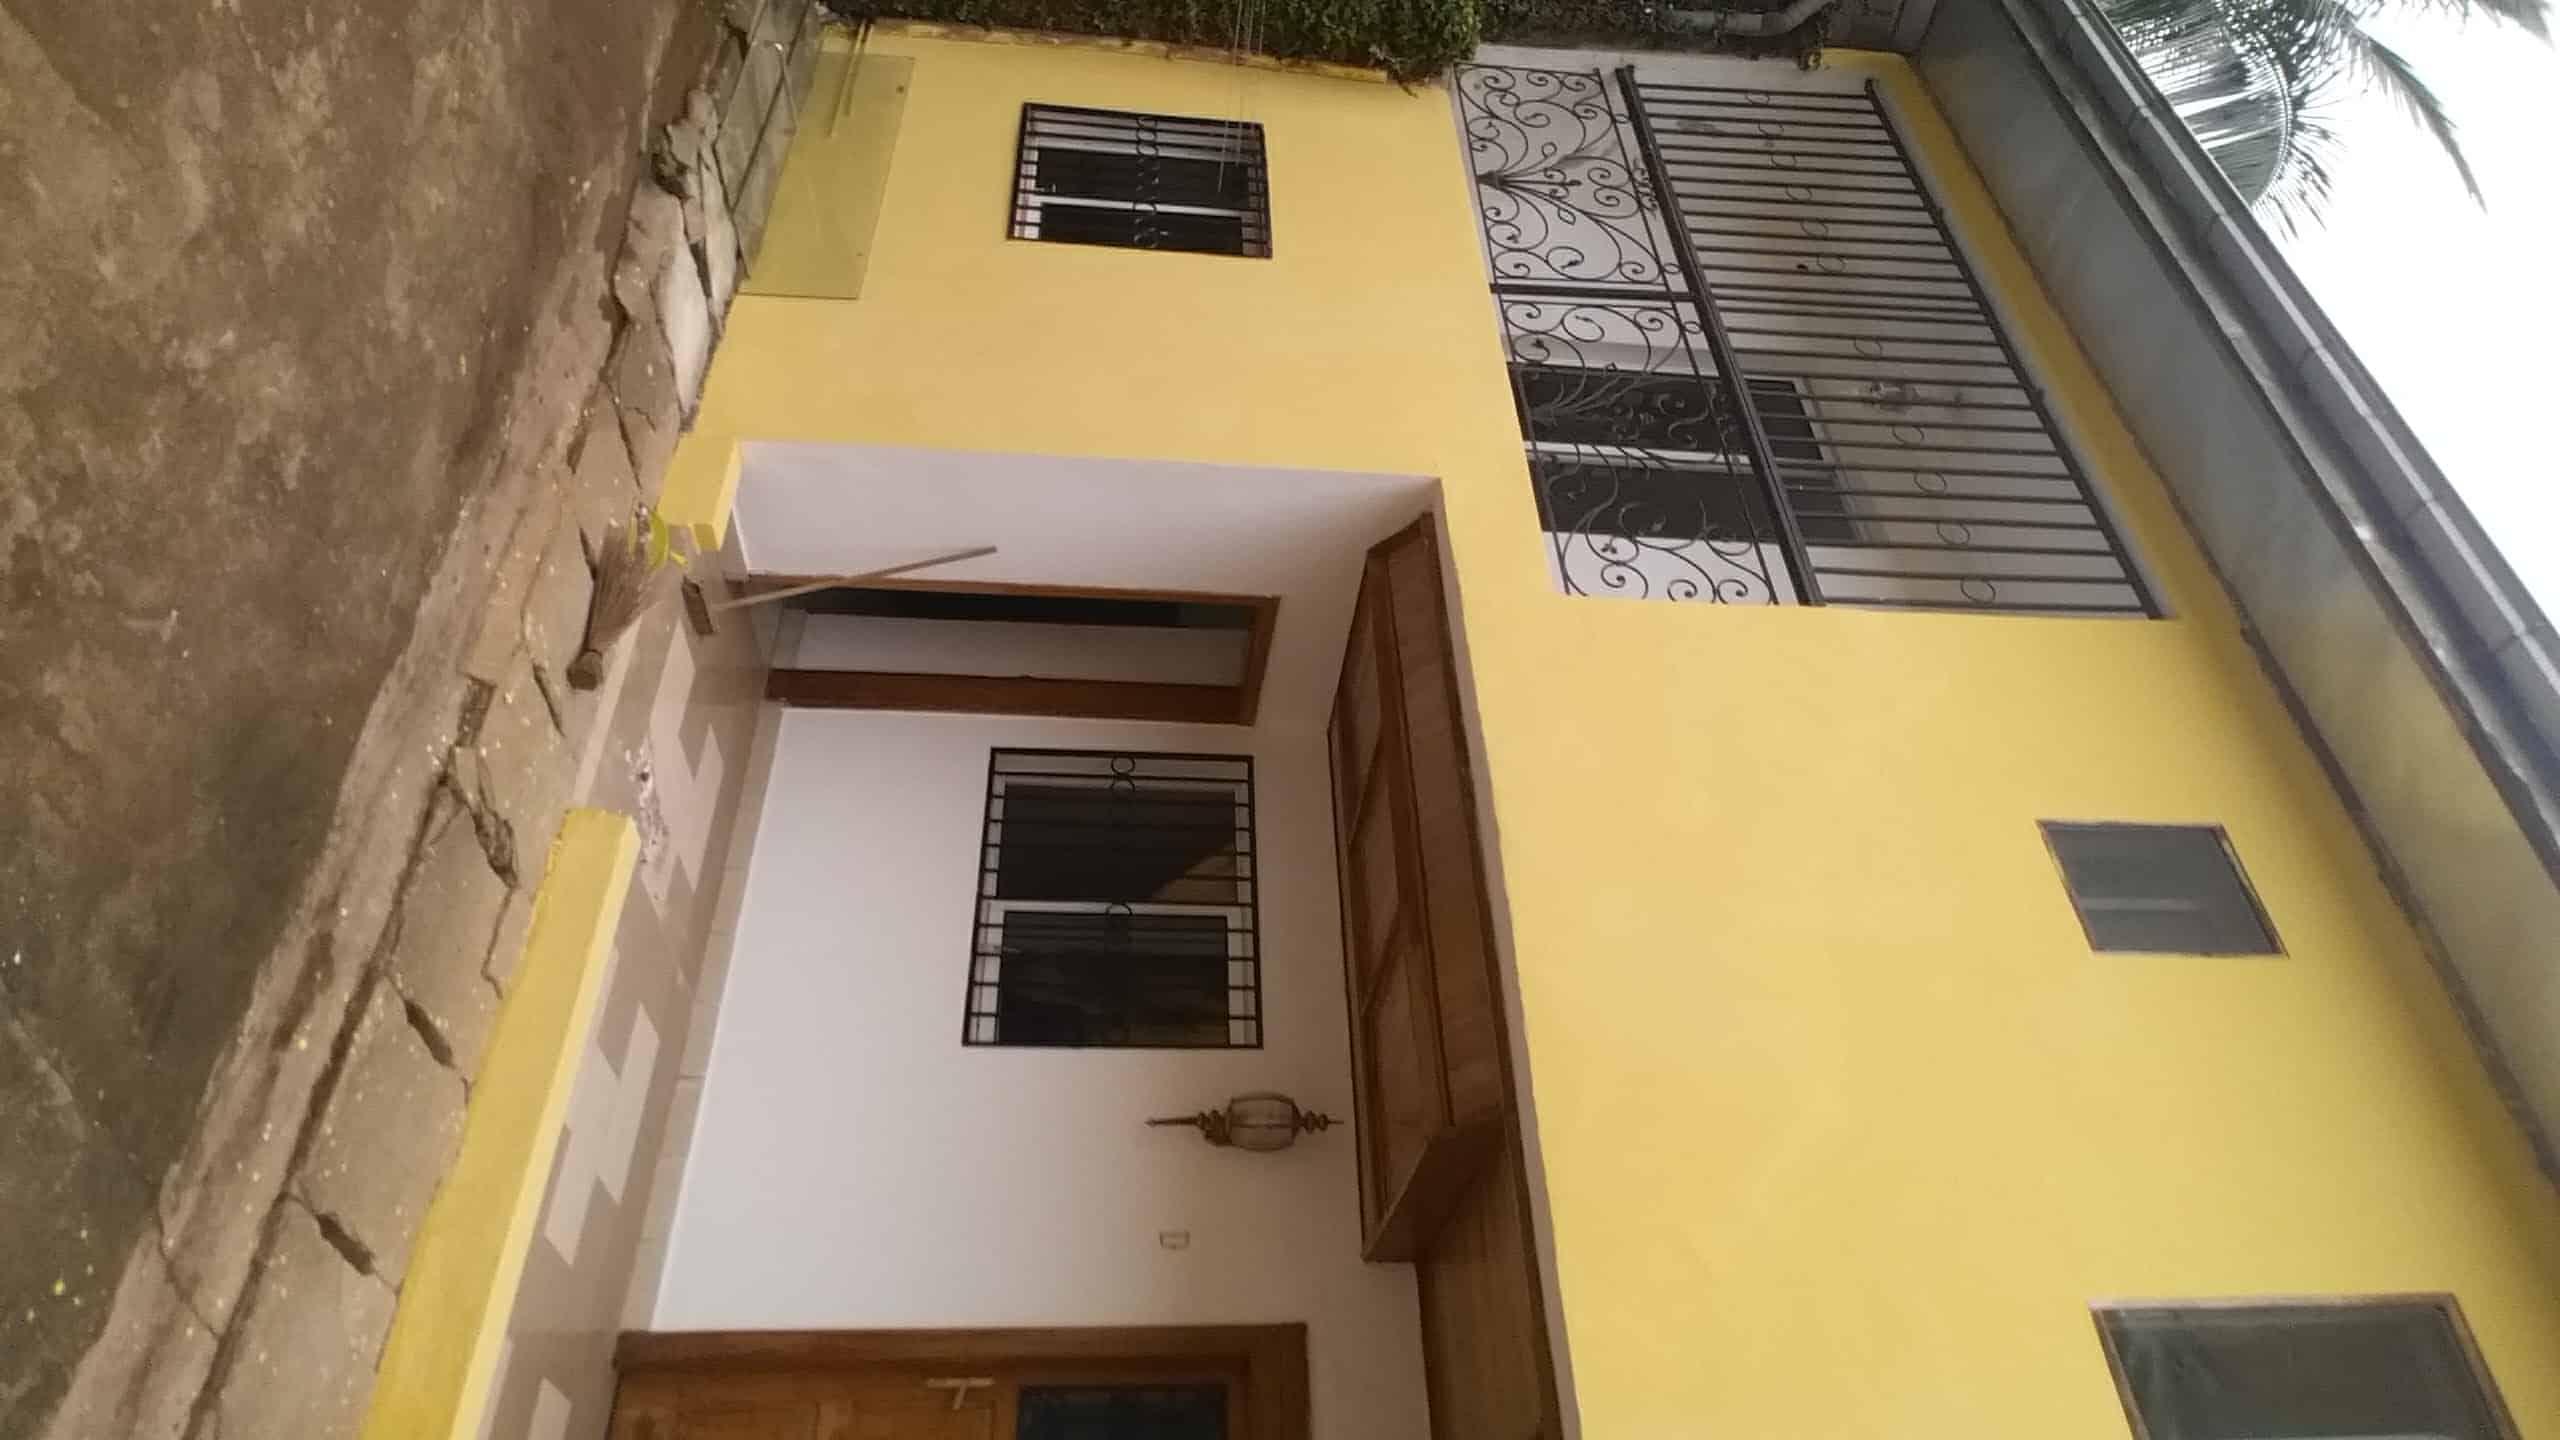 Apartment to rent - Yaoundé, Bastos, Golf - 2 living room(s), 3 bedroom(s), 3 bathroom(s) - 350 000 FCFA / month